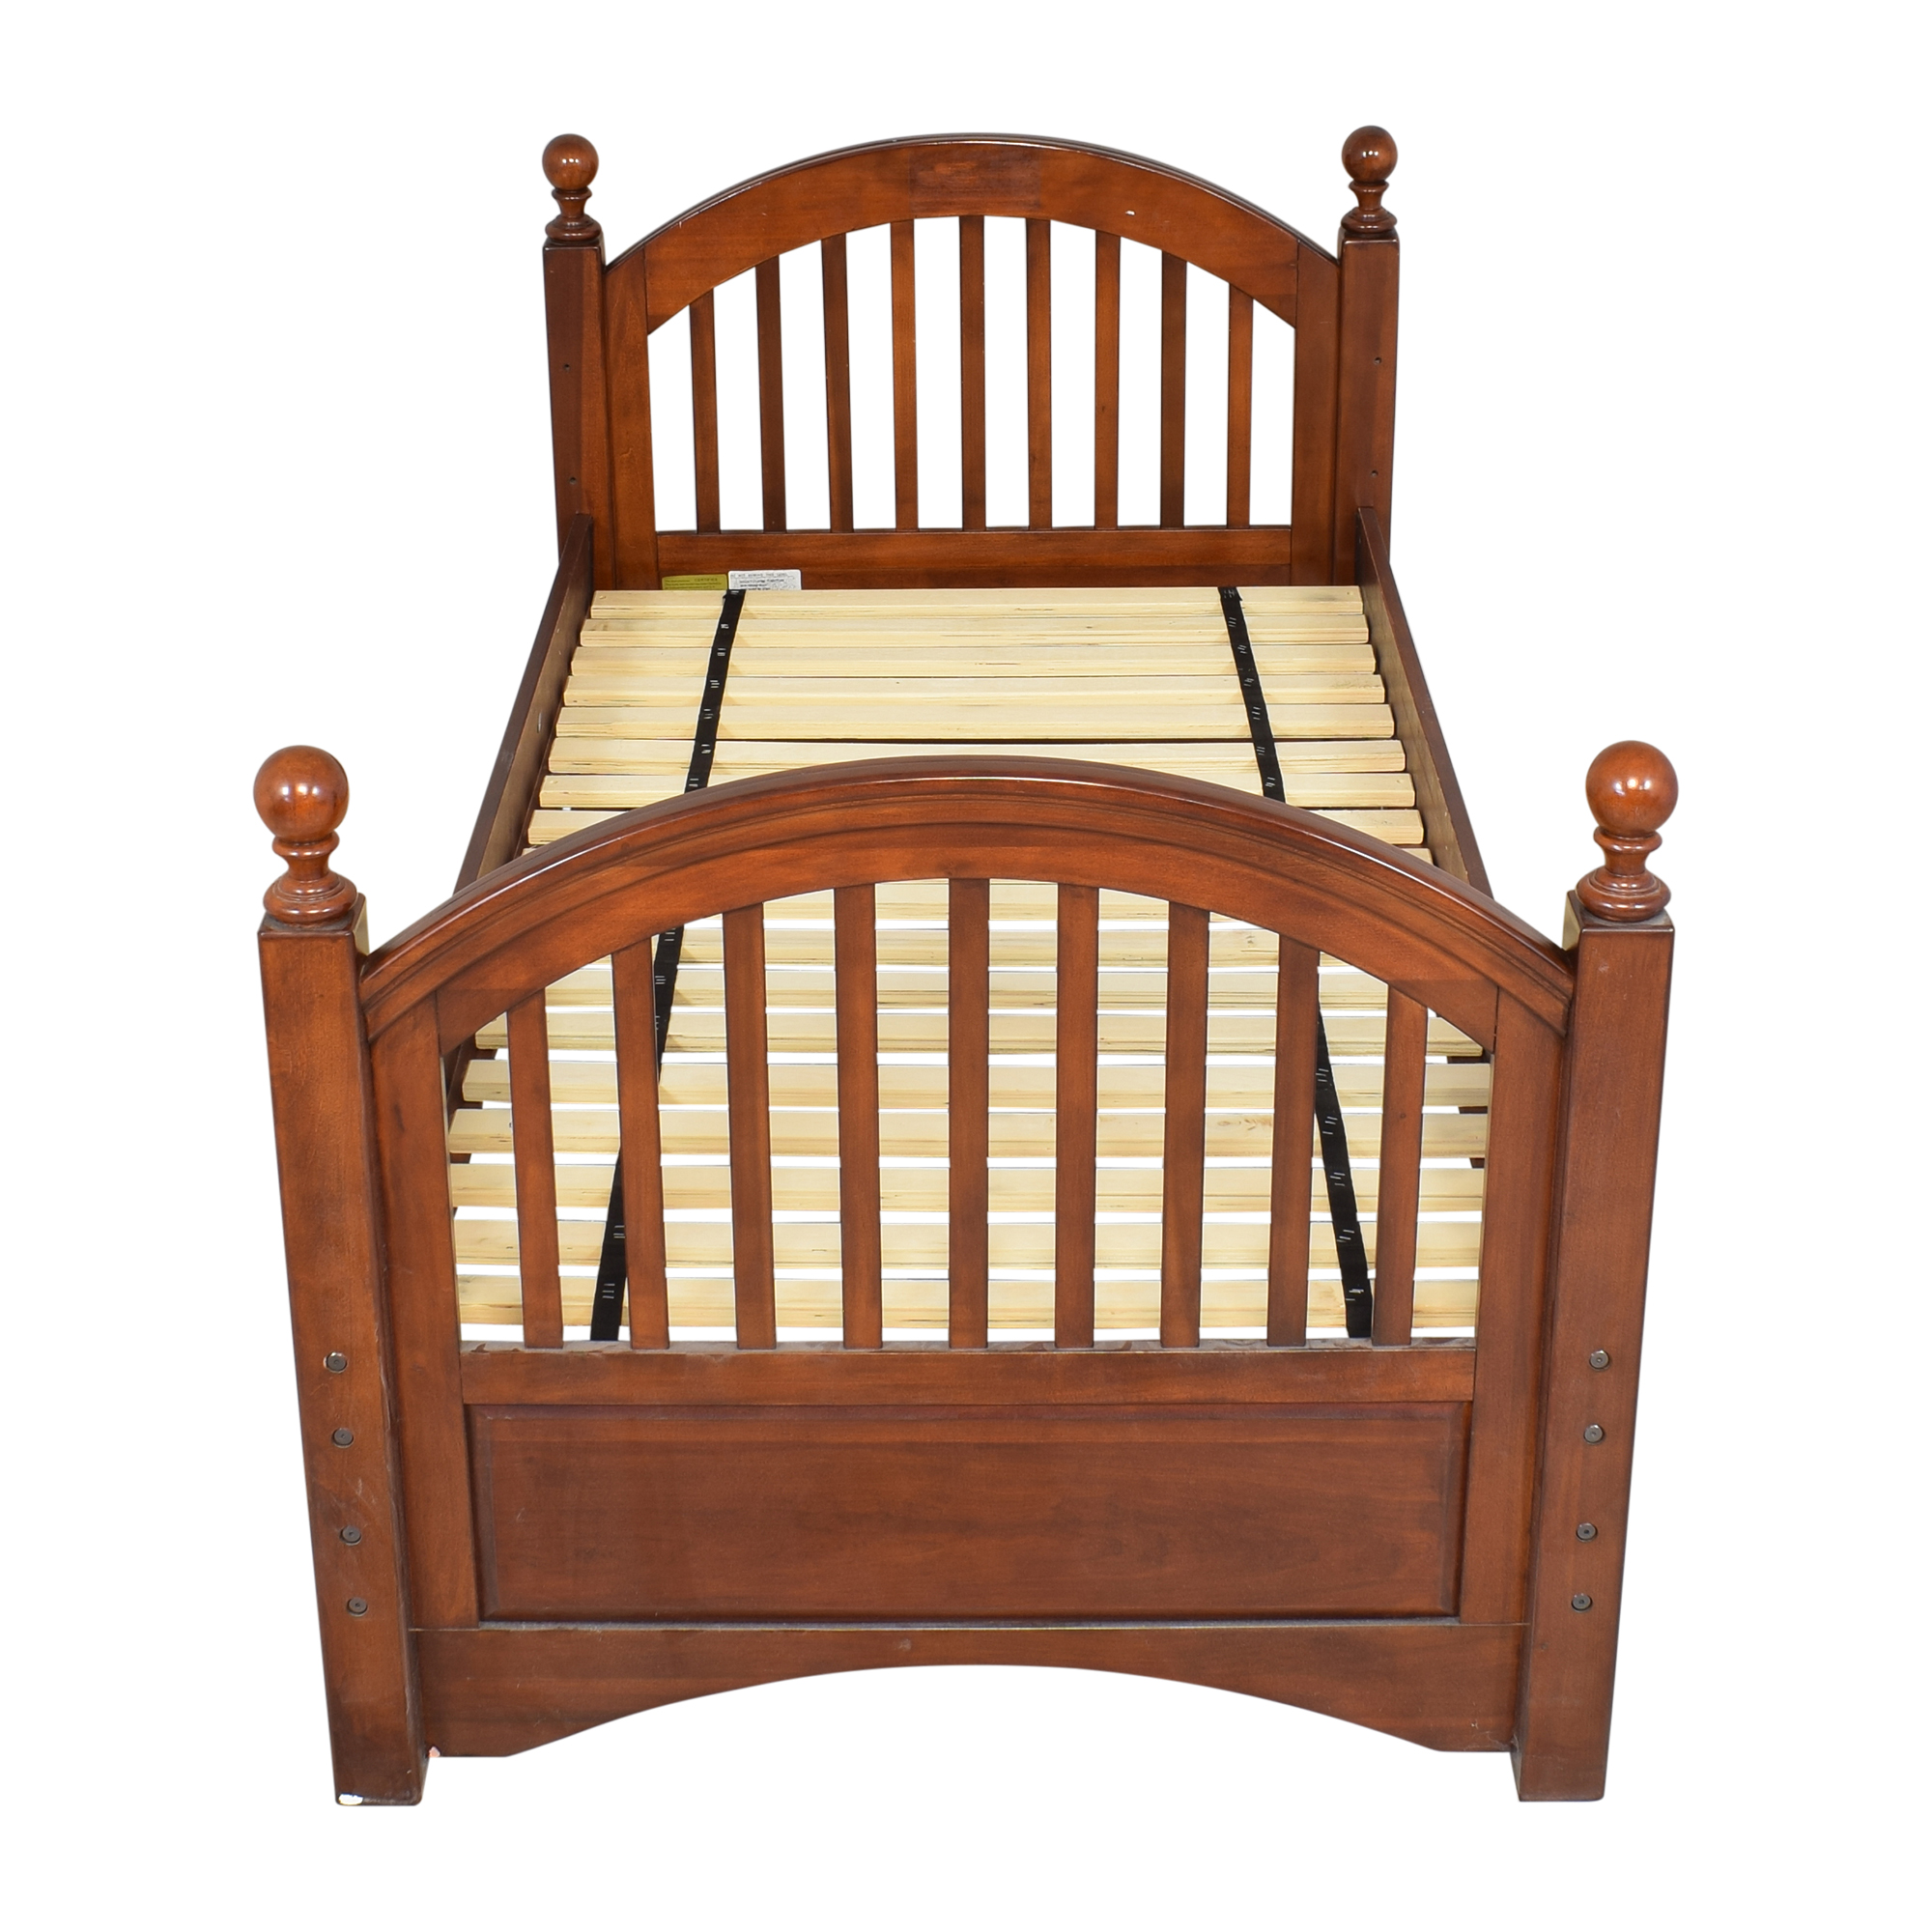 Legacy Classic Furniture Legacy Classic Slat Twin Bed nj